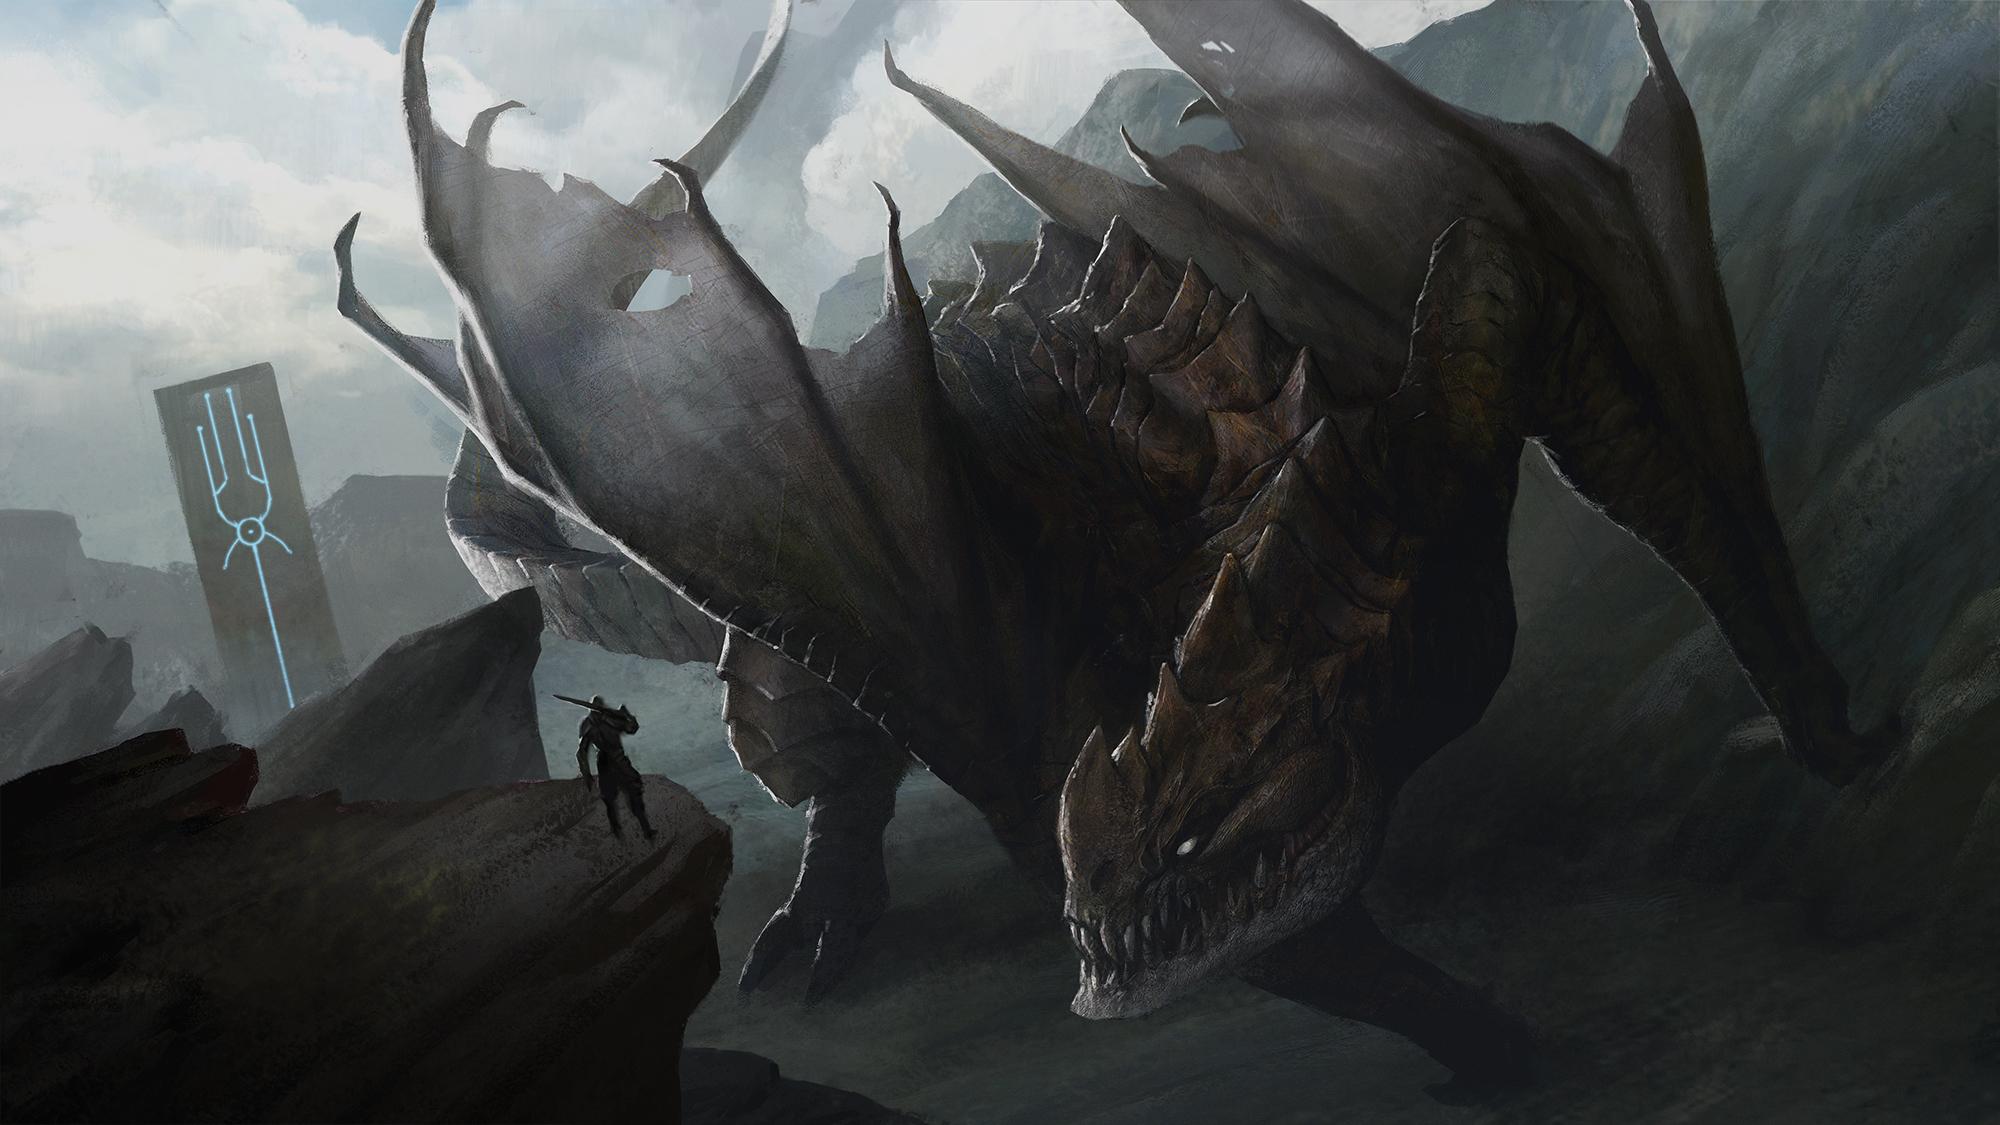 infinity_blade_III_-_16x9_dragon_spread_illustration_hi-res.png